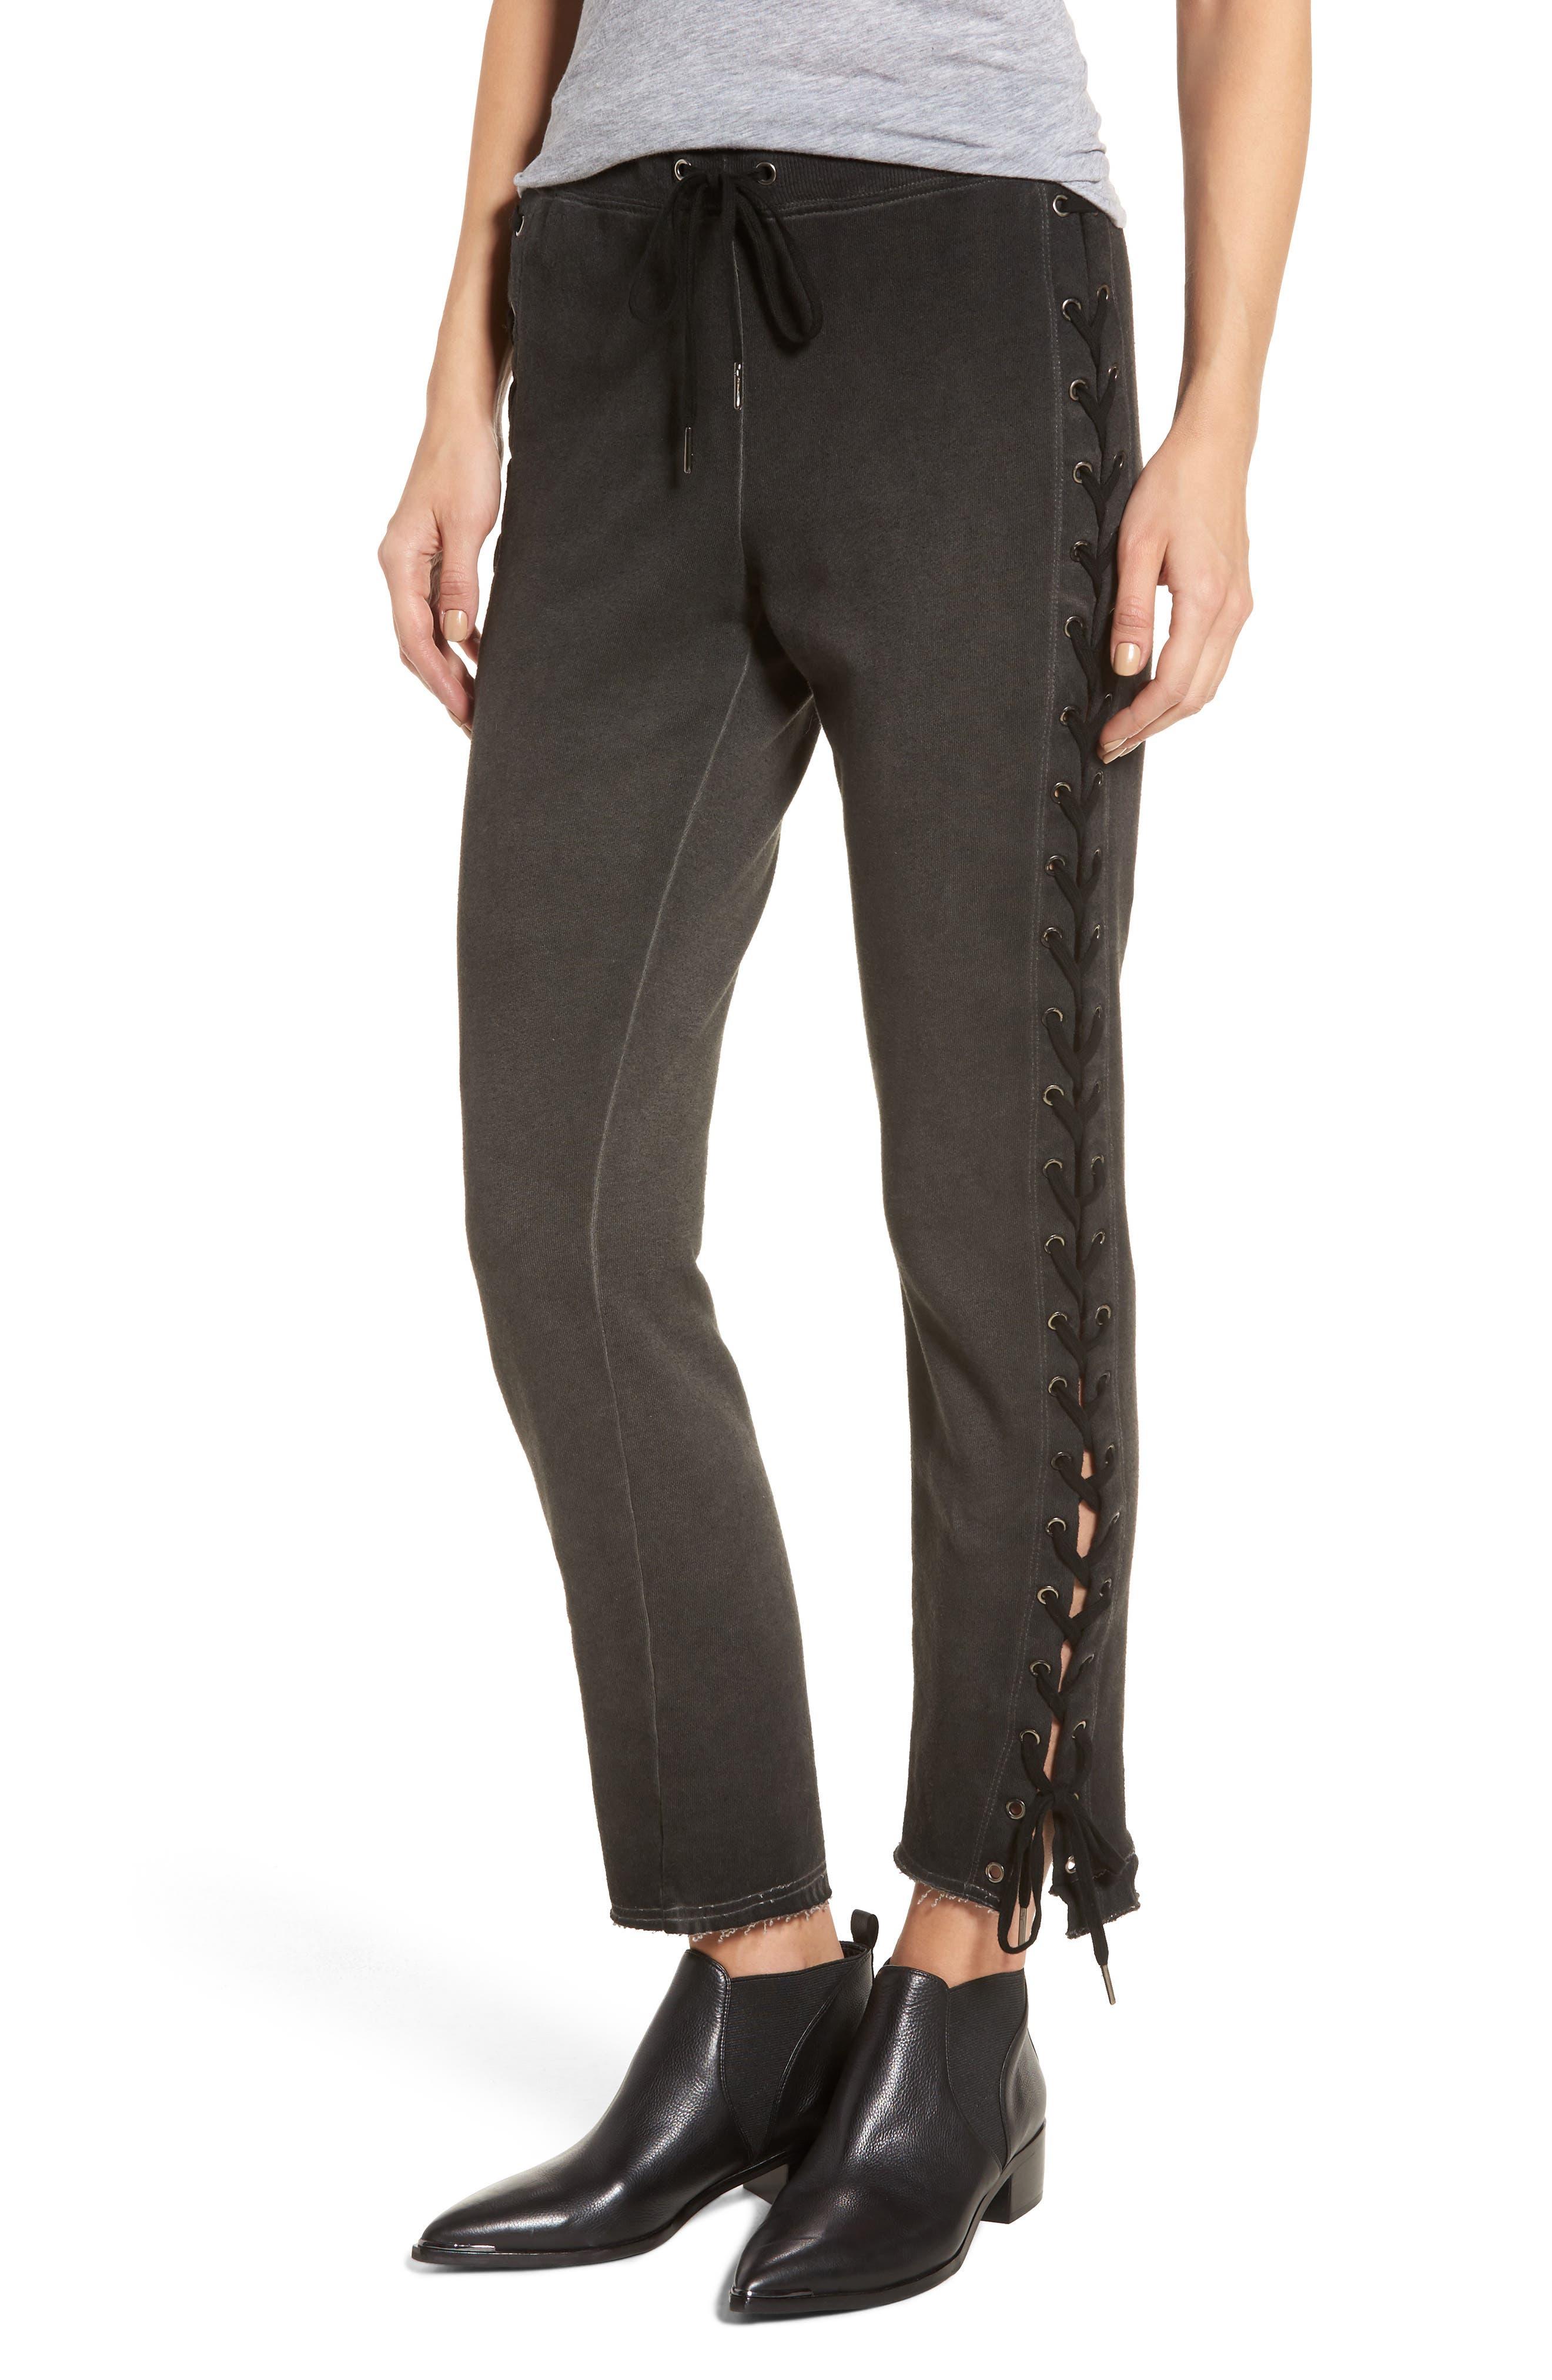 Main Image - Pam & Gela Lace-Up Sweatpants